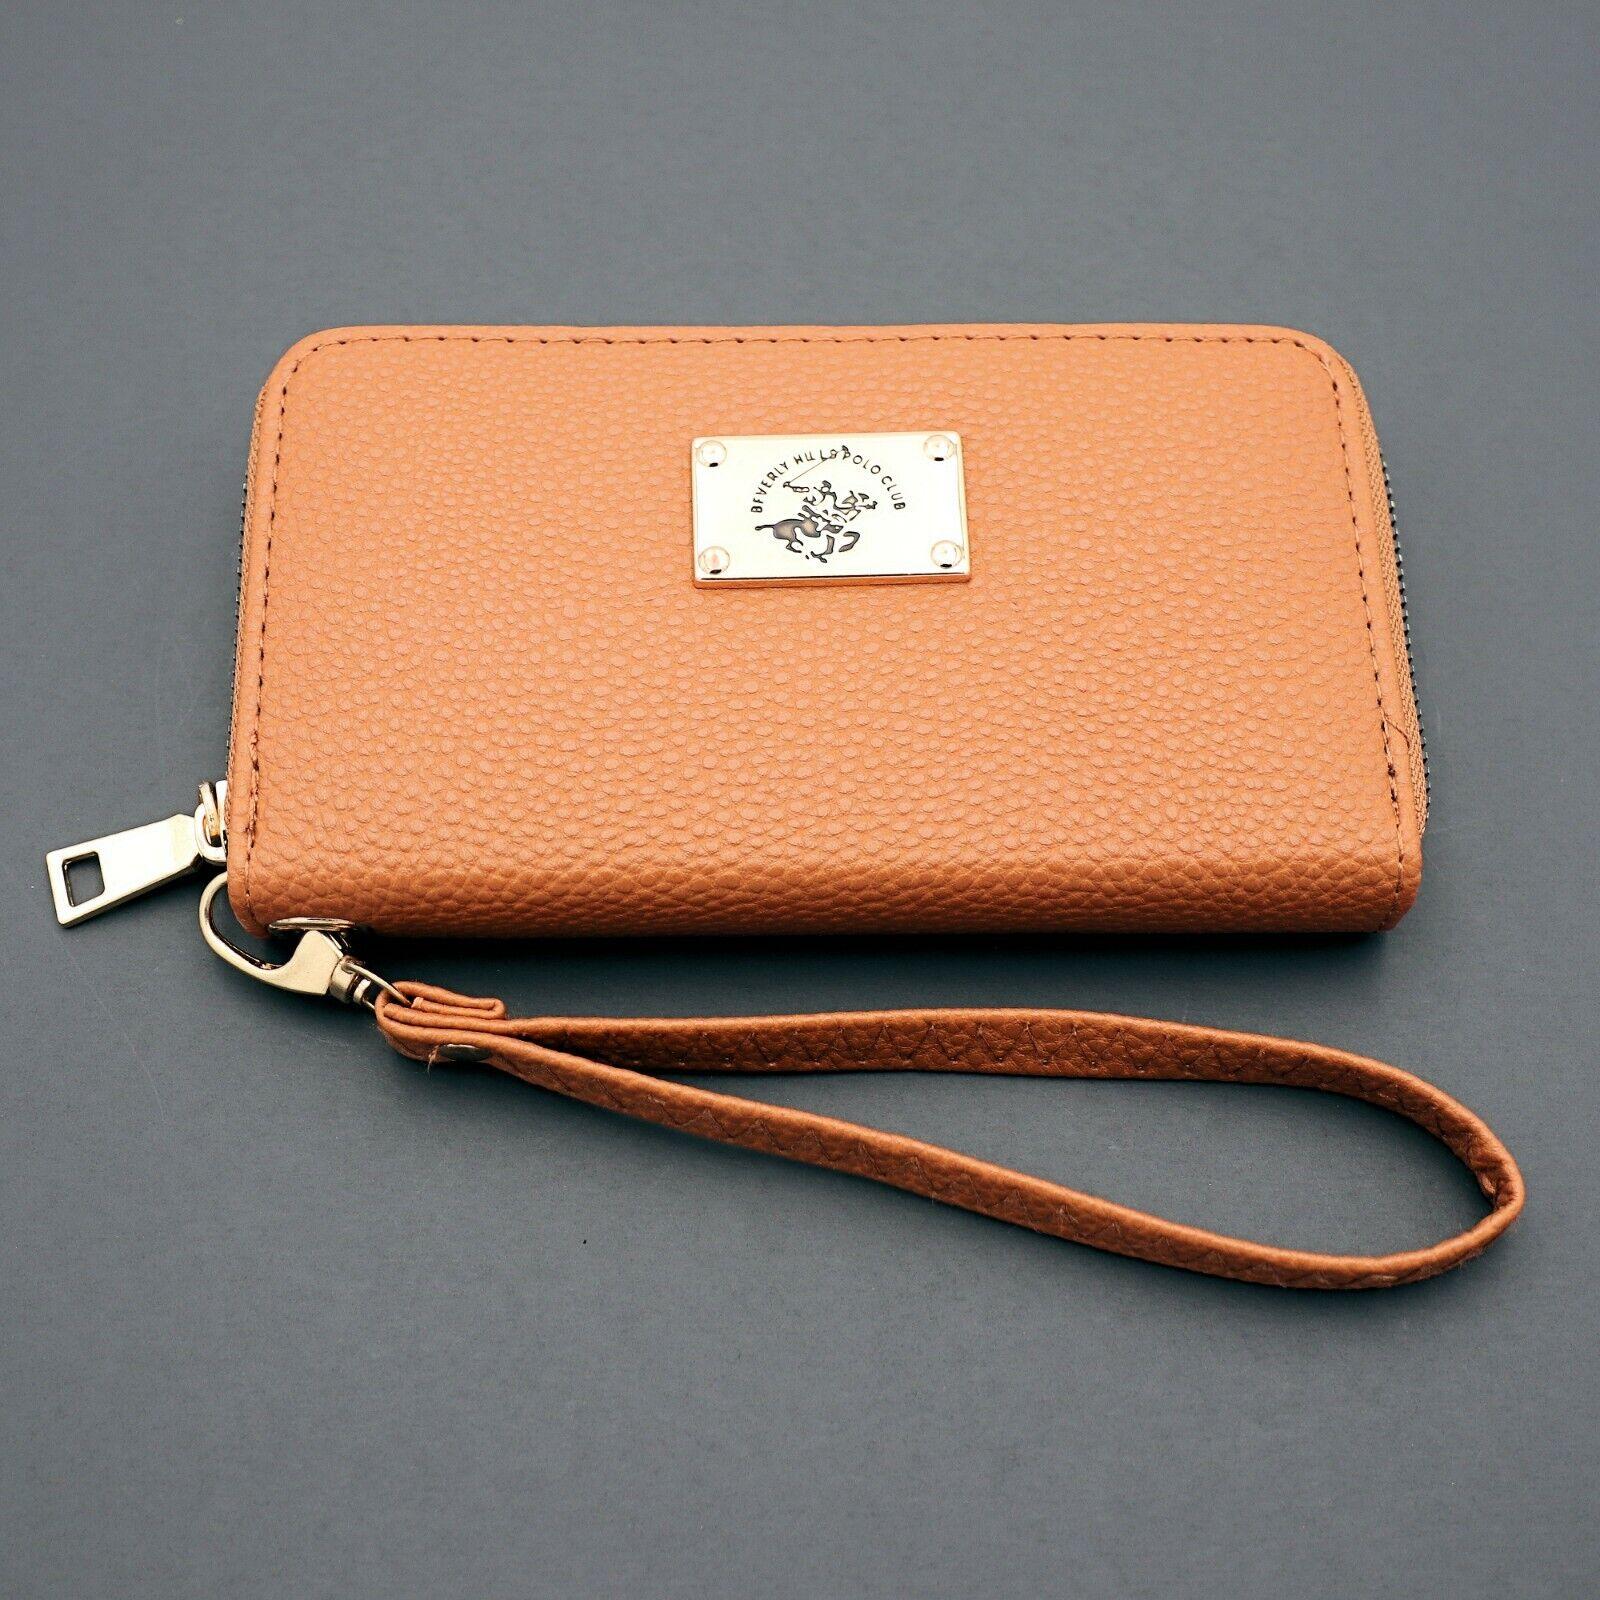 Beverly Hills Polo Club Croc Faux Leather Wristlet Clutch W// Zip Around Wallet